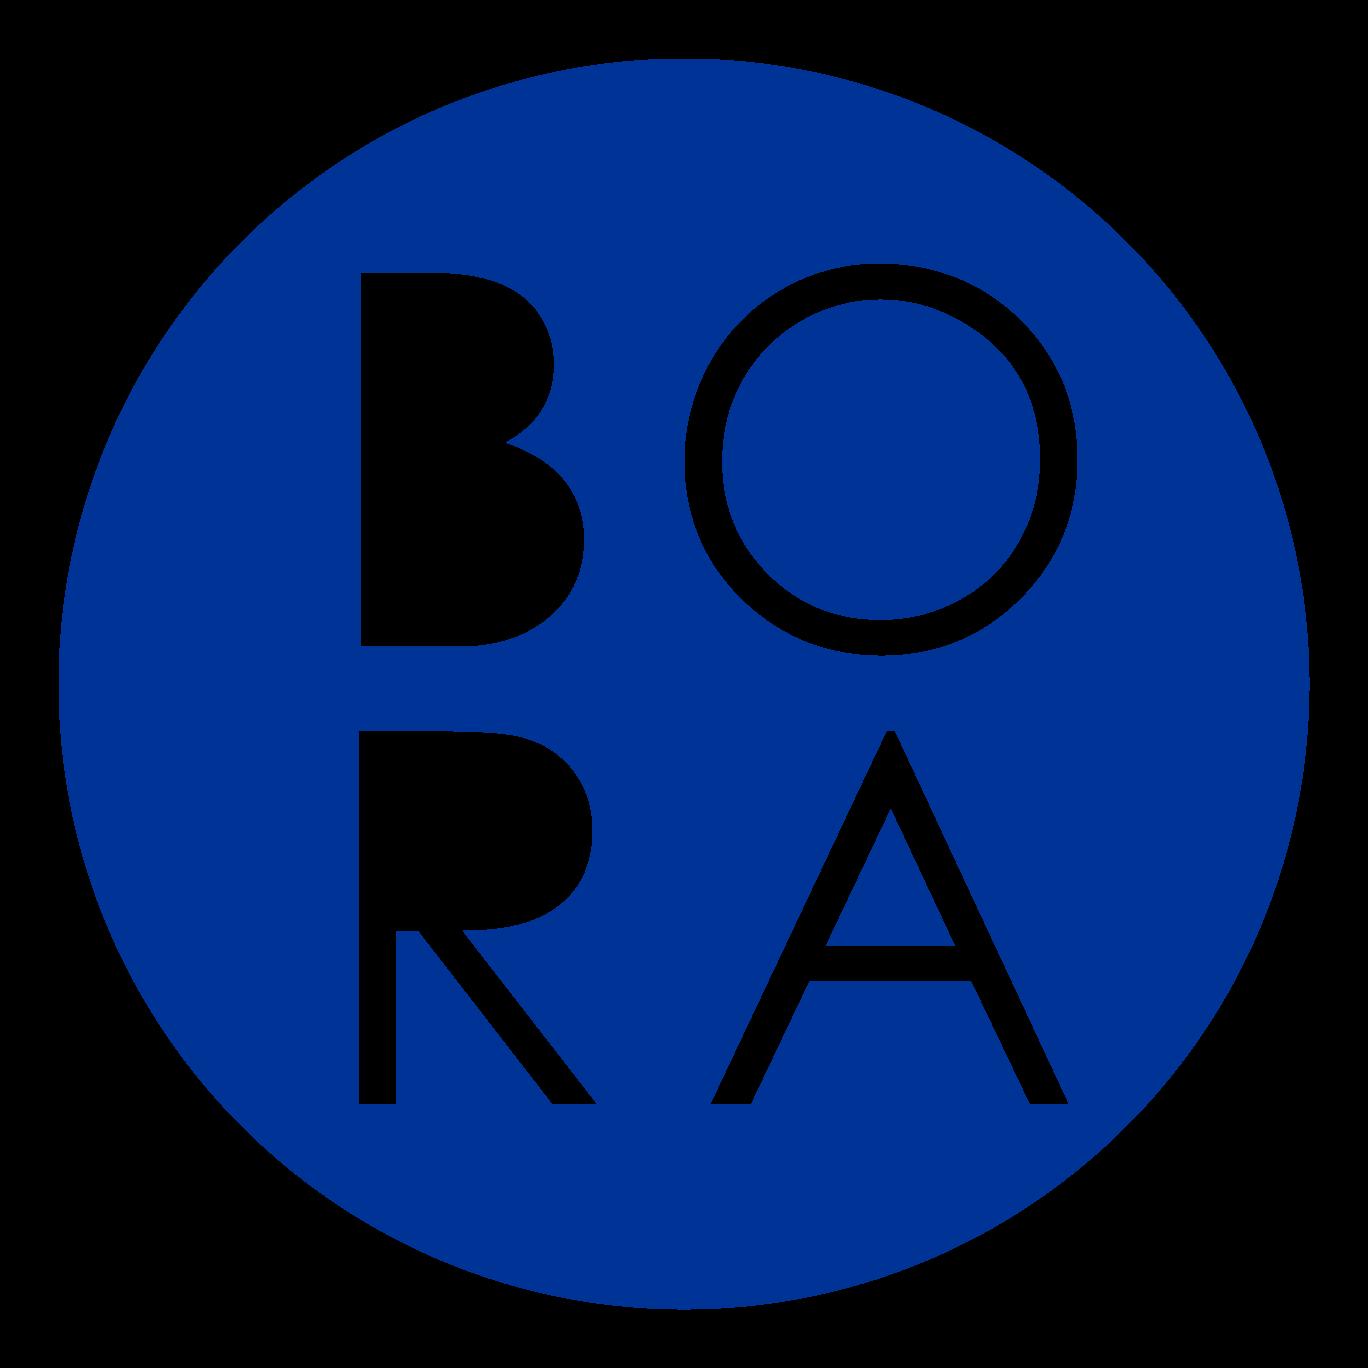 #bora.arq